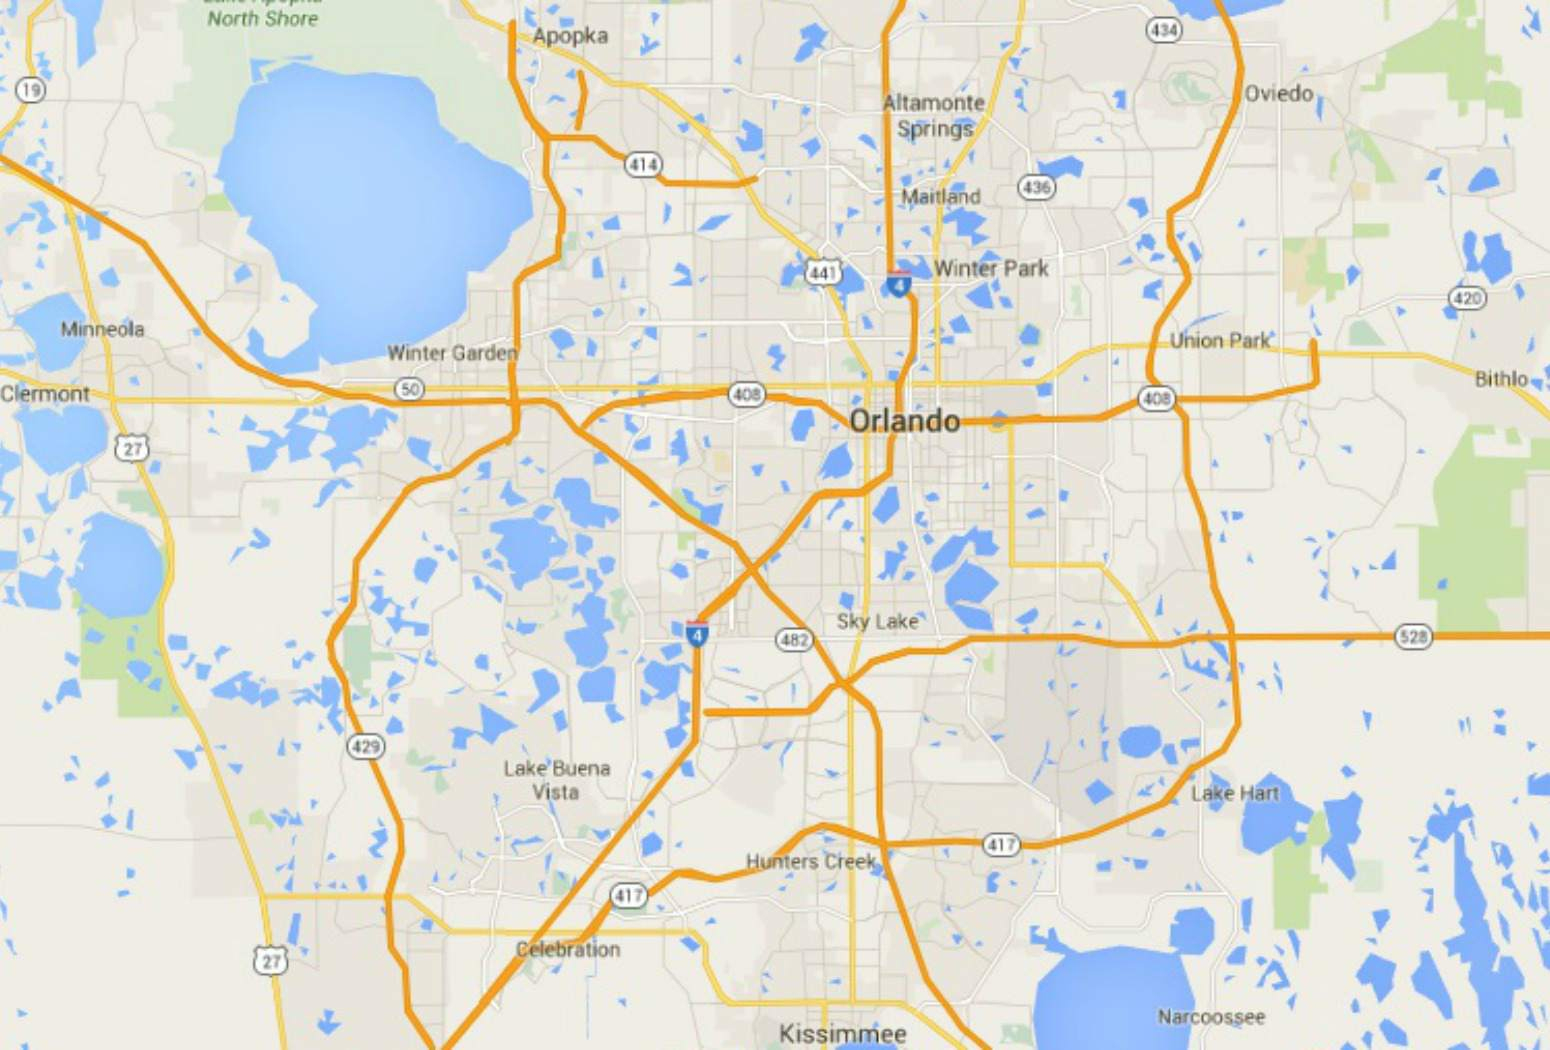 Maps Of Florida: Orlando, Tampa, Miami, Keys, And More - Davenport Florida Map